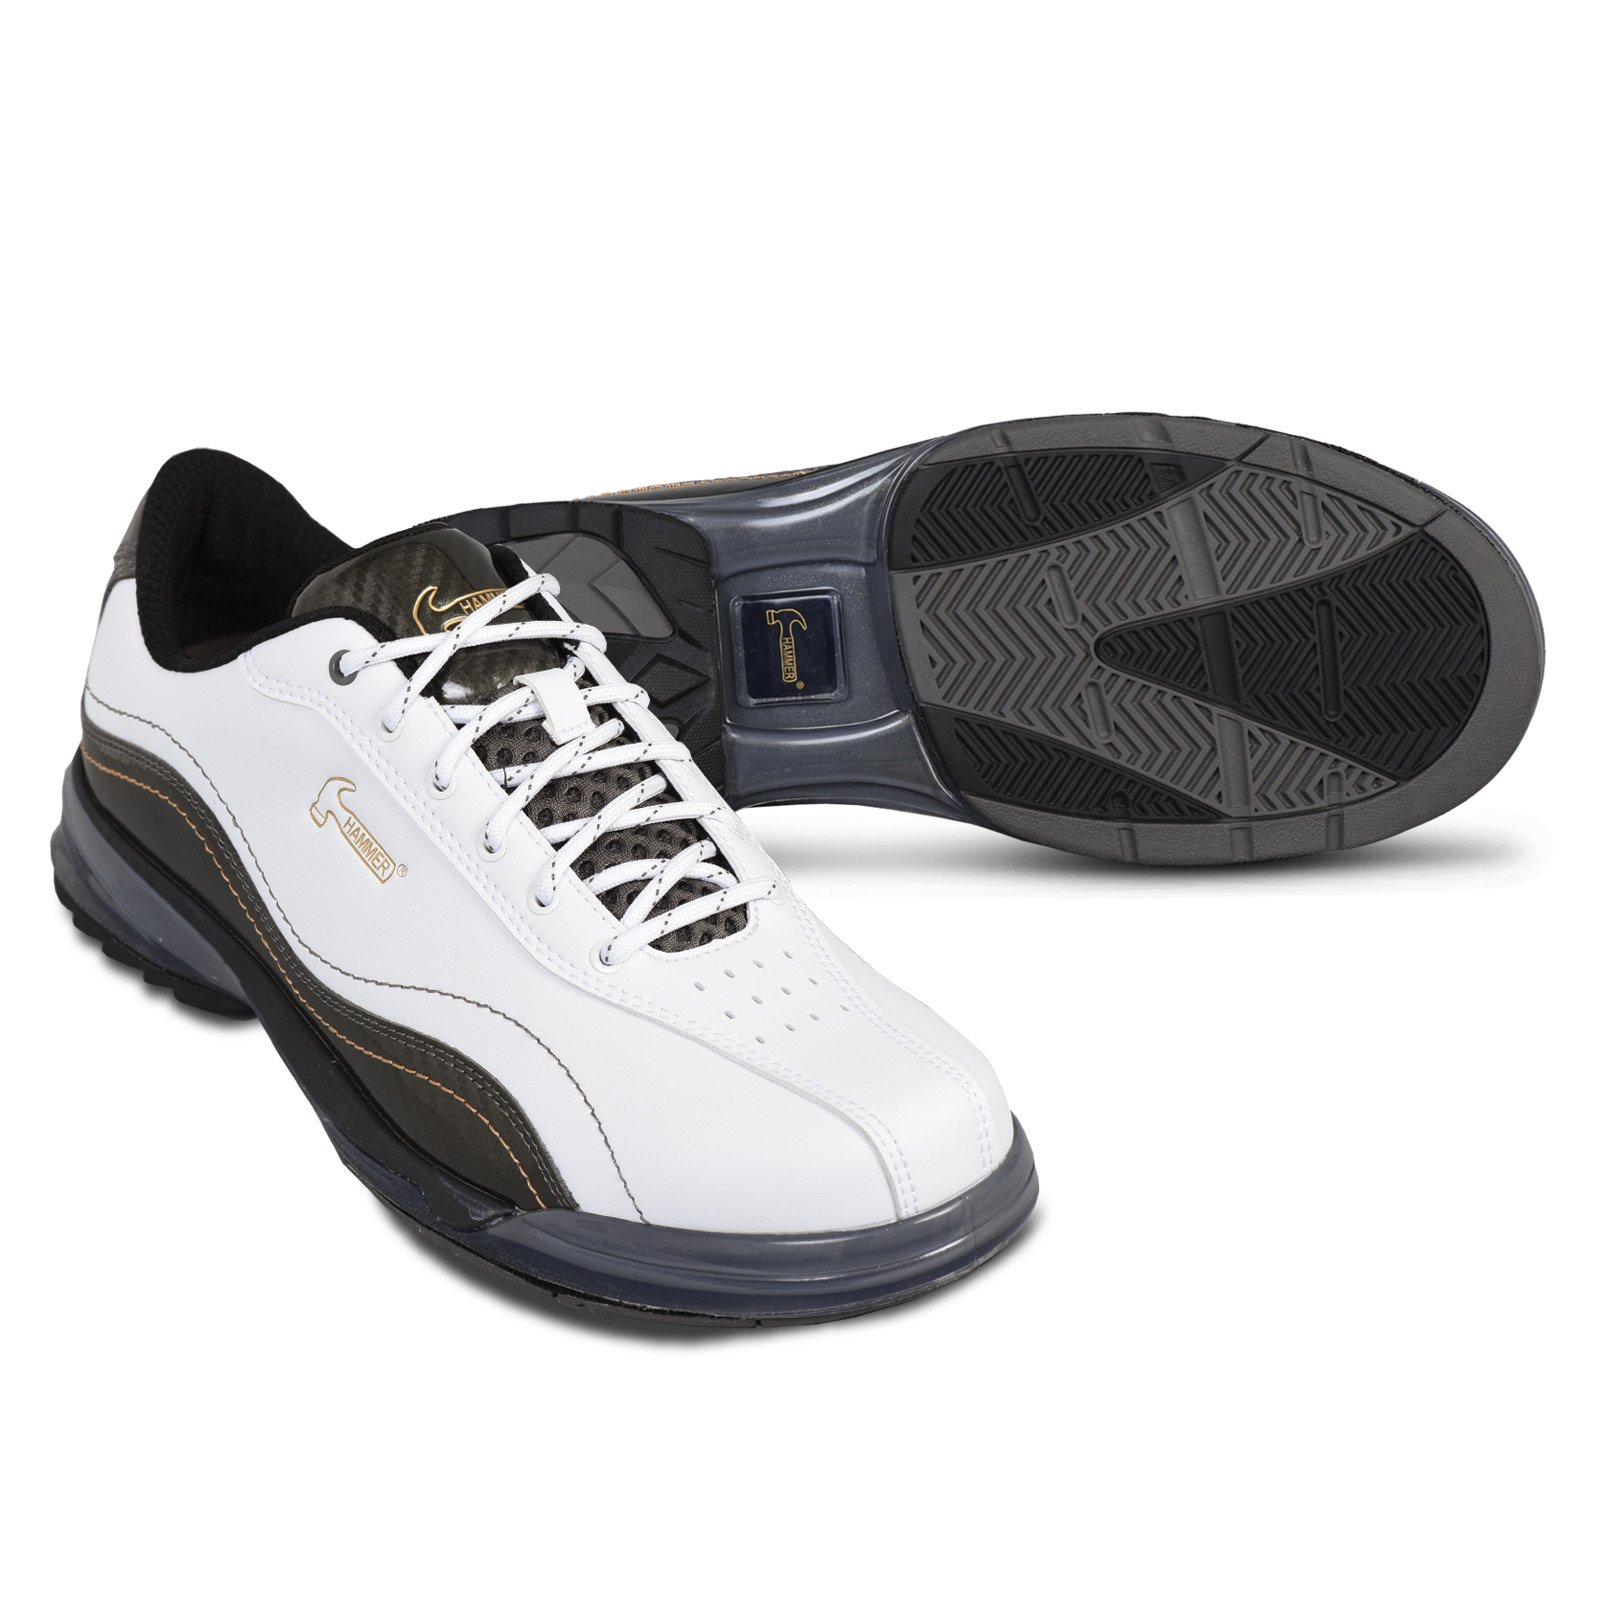 KR Strikeforce Men's Hammer Performance Bowling Shoes, White/Carbon, Size 9.5 by KR Strikeforce